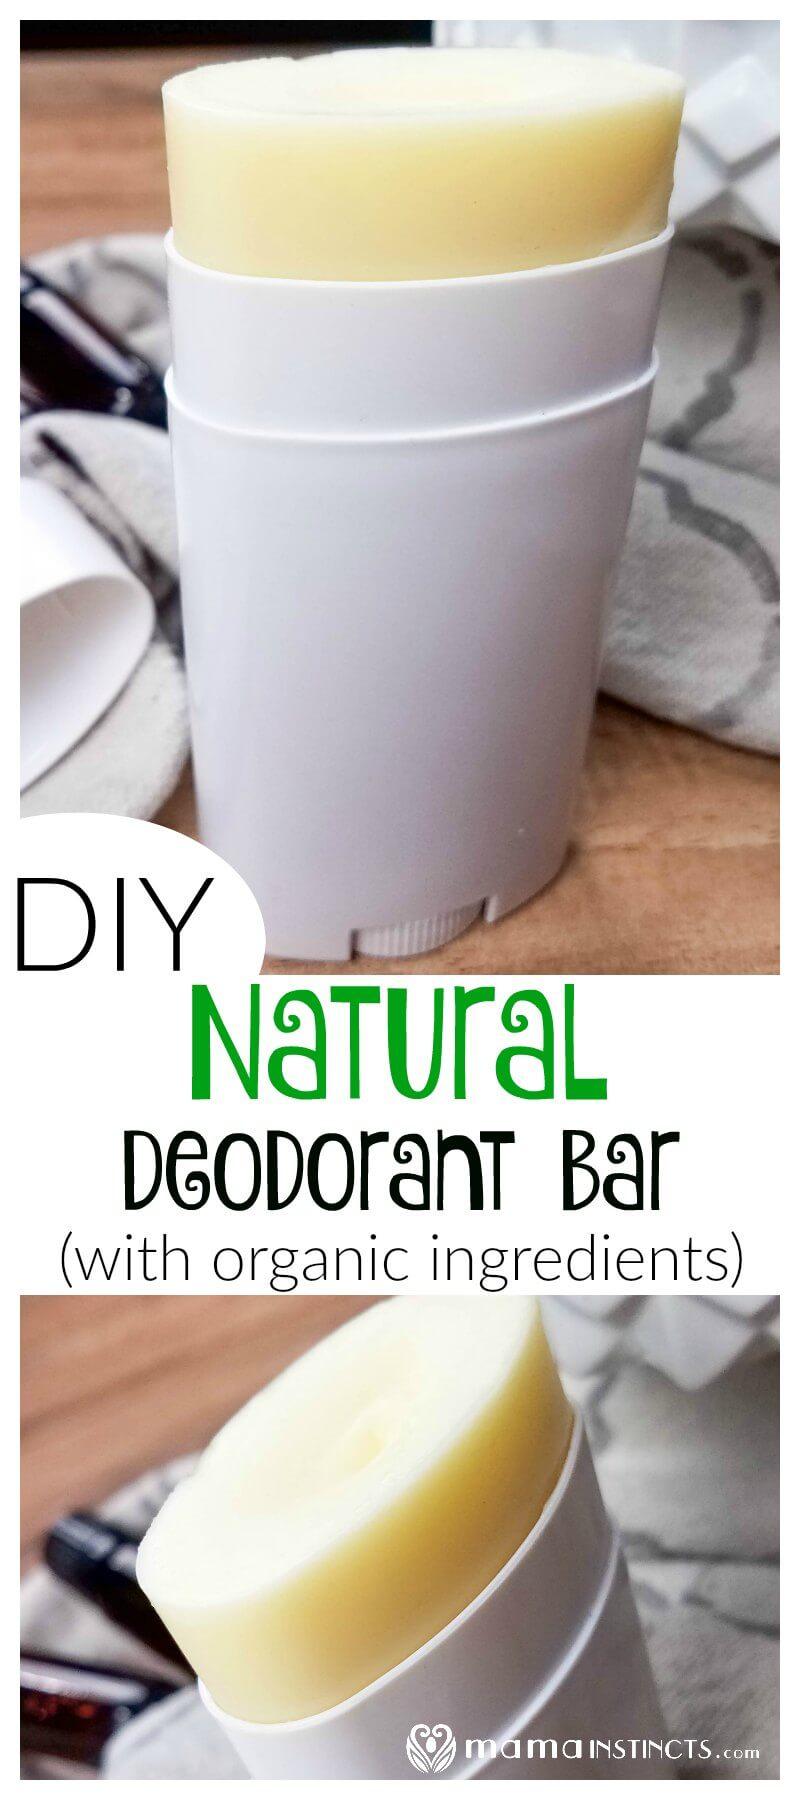 DIY Natural Deodorant Bar (with Organic Ingredients) – Mama Instincts®